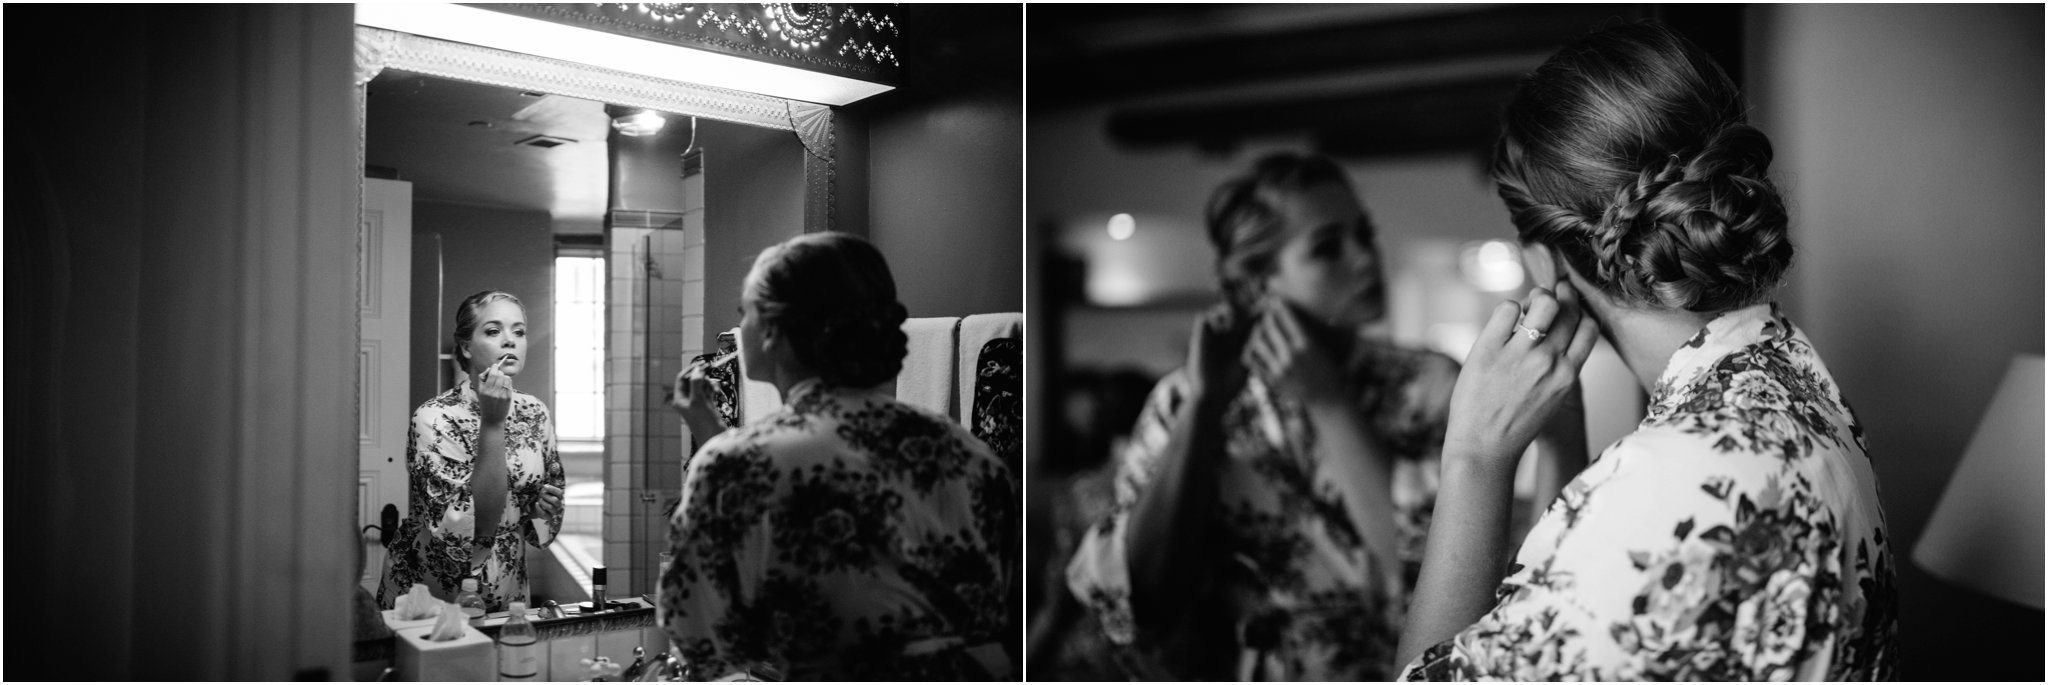 0016albuquerque-wedding-photographer_-santa-fe-wedding-photographer_-southwest-wedding-photography_-blue-rose-studio